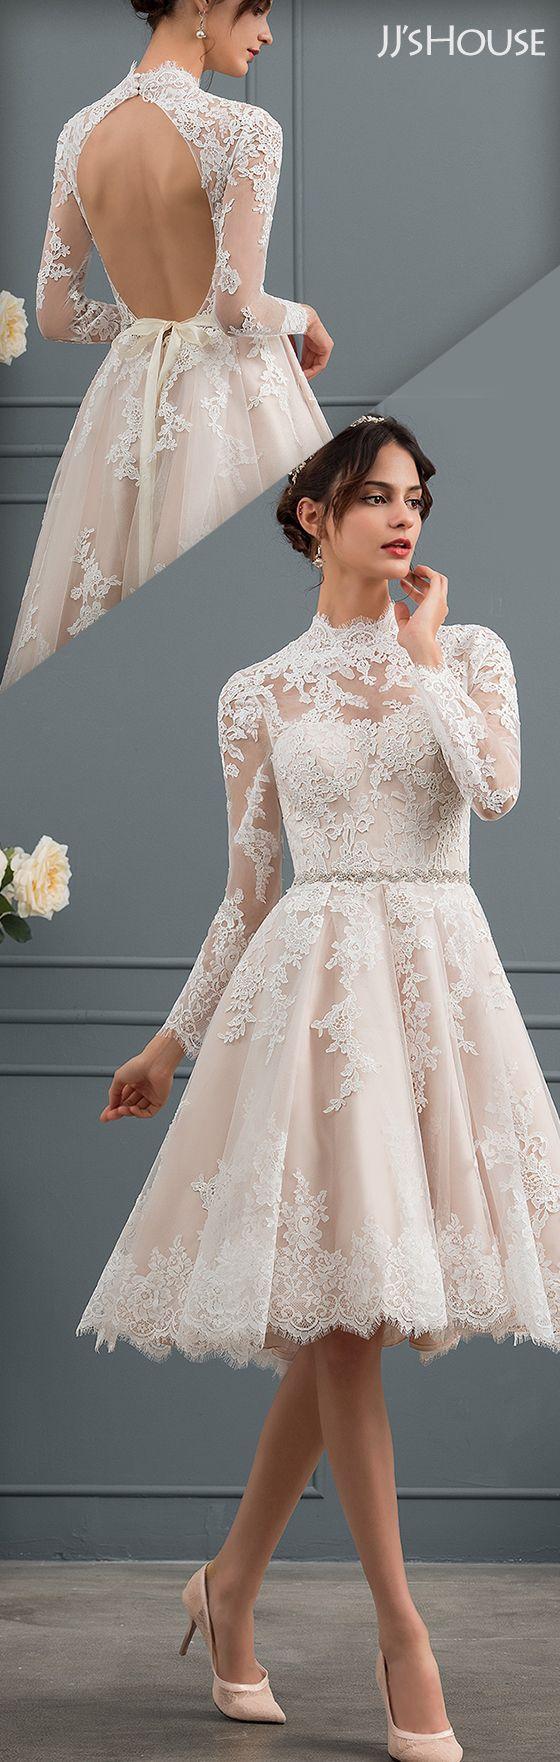 Short Wedding Dresses  High Neck Knee Length Lace Wedding Dress ...